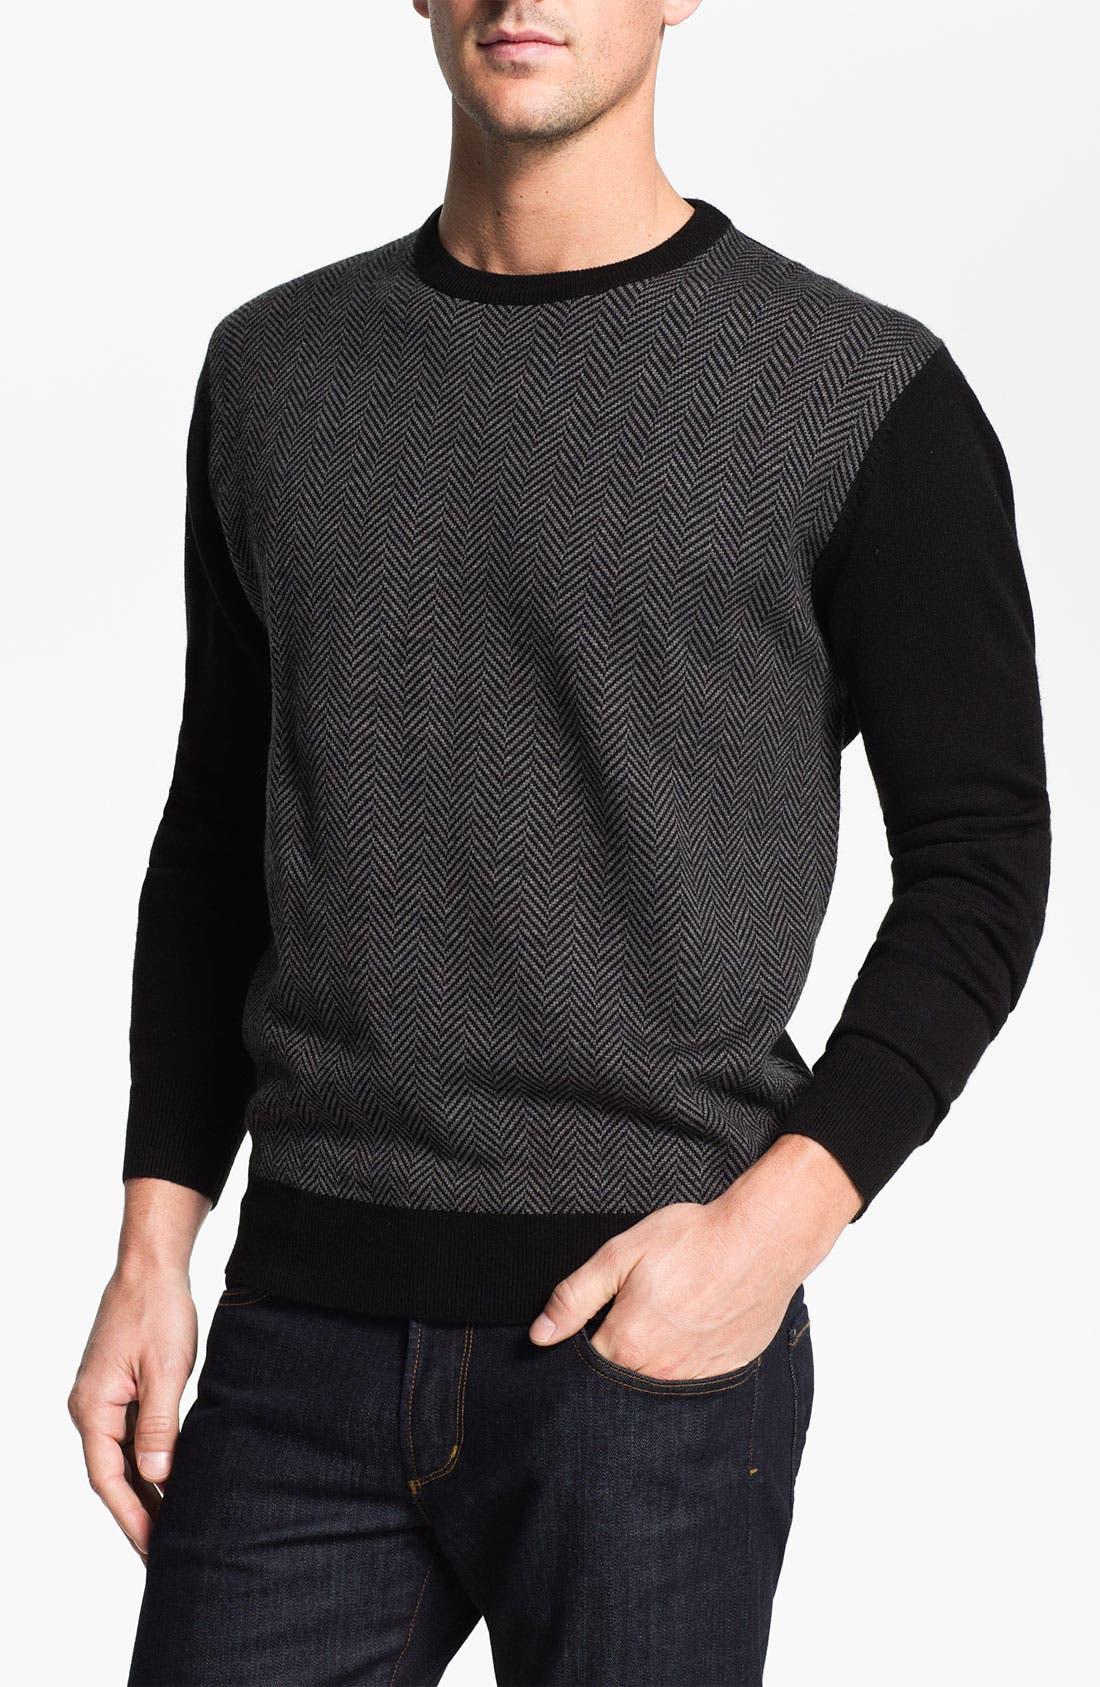 Alternate Image 1 Selected - Toscano Wool Blend Crewneck Sweater